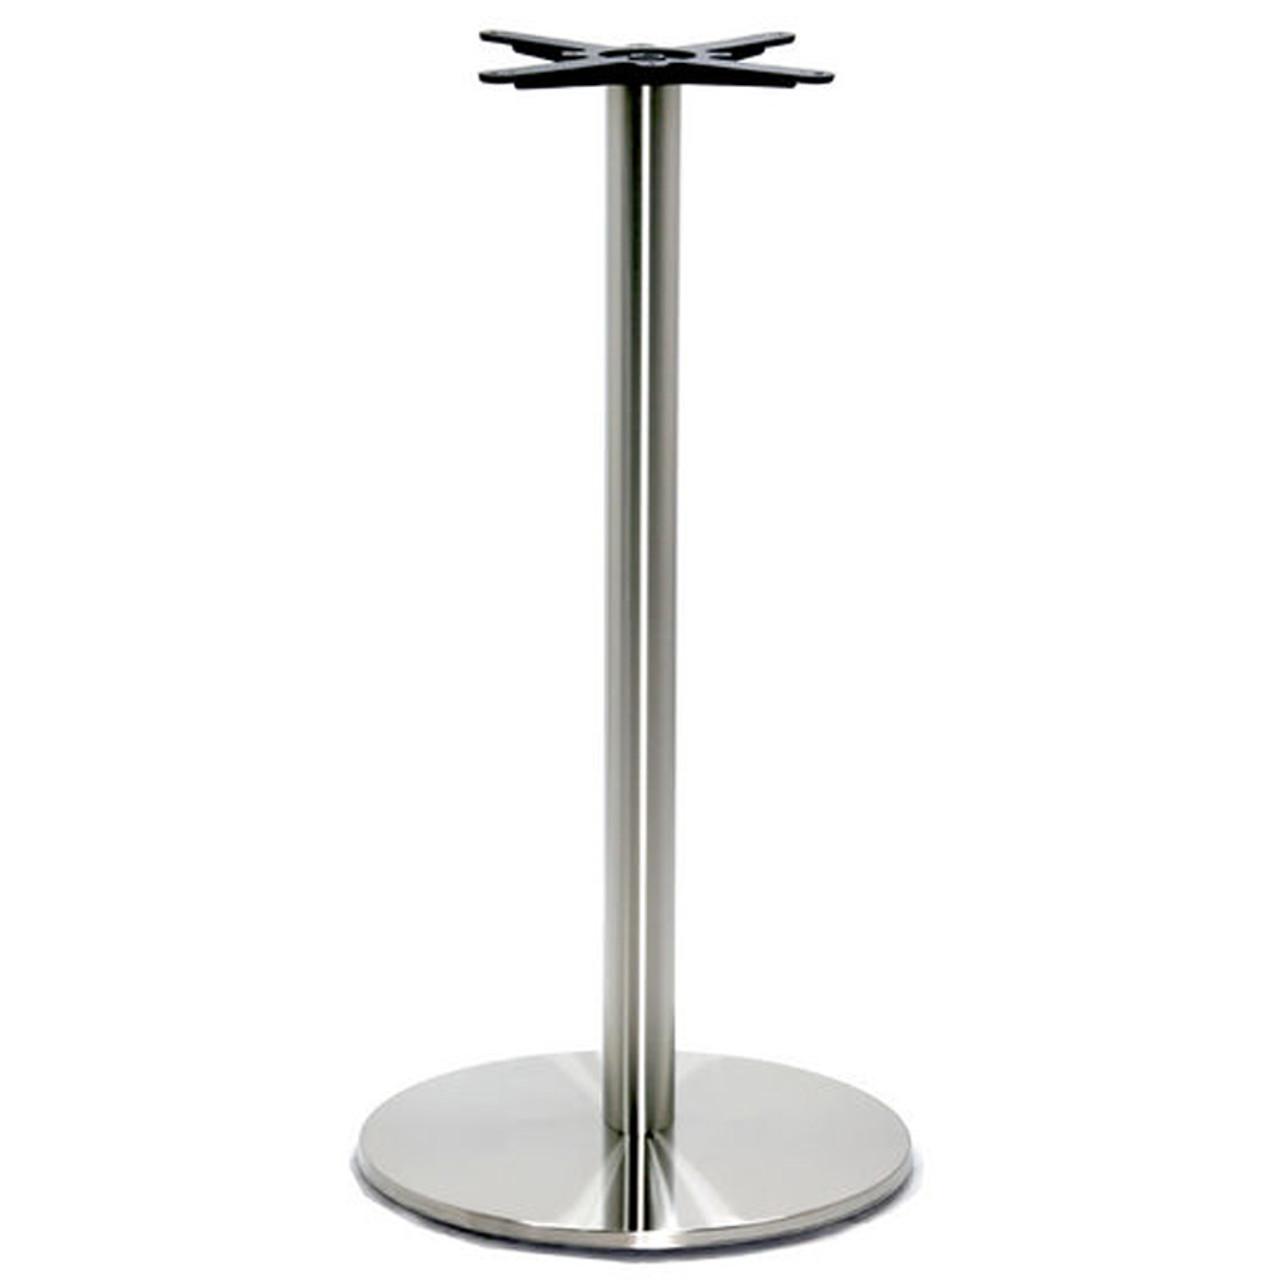 Round Pedestal Table Base Brushed Stainless Steel 40 3 8 Bar Height 17 Round Base 3 Diameter Steel Column Single Replacementtablelegs Com